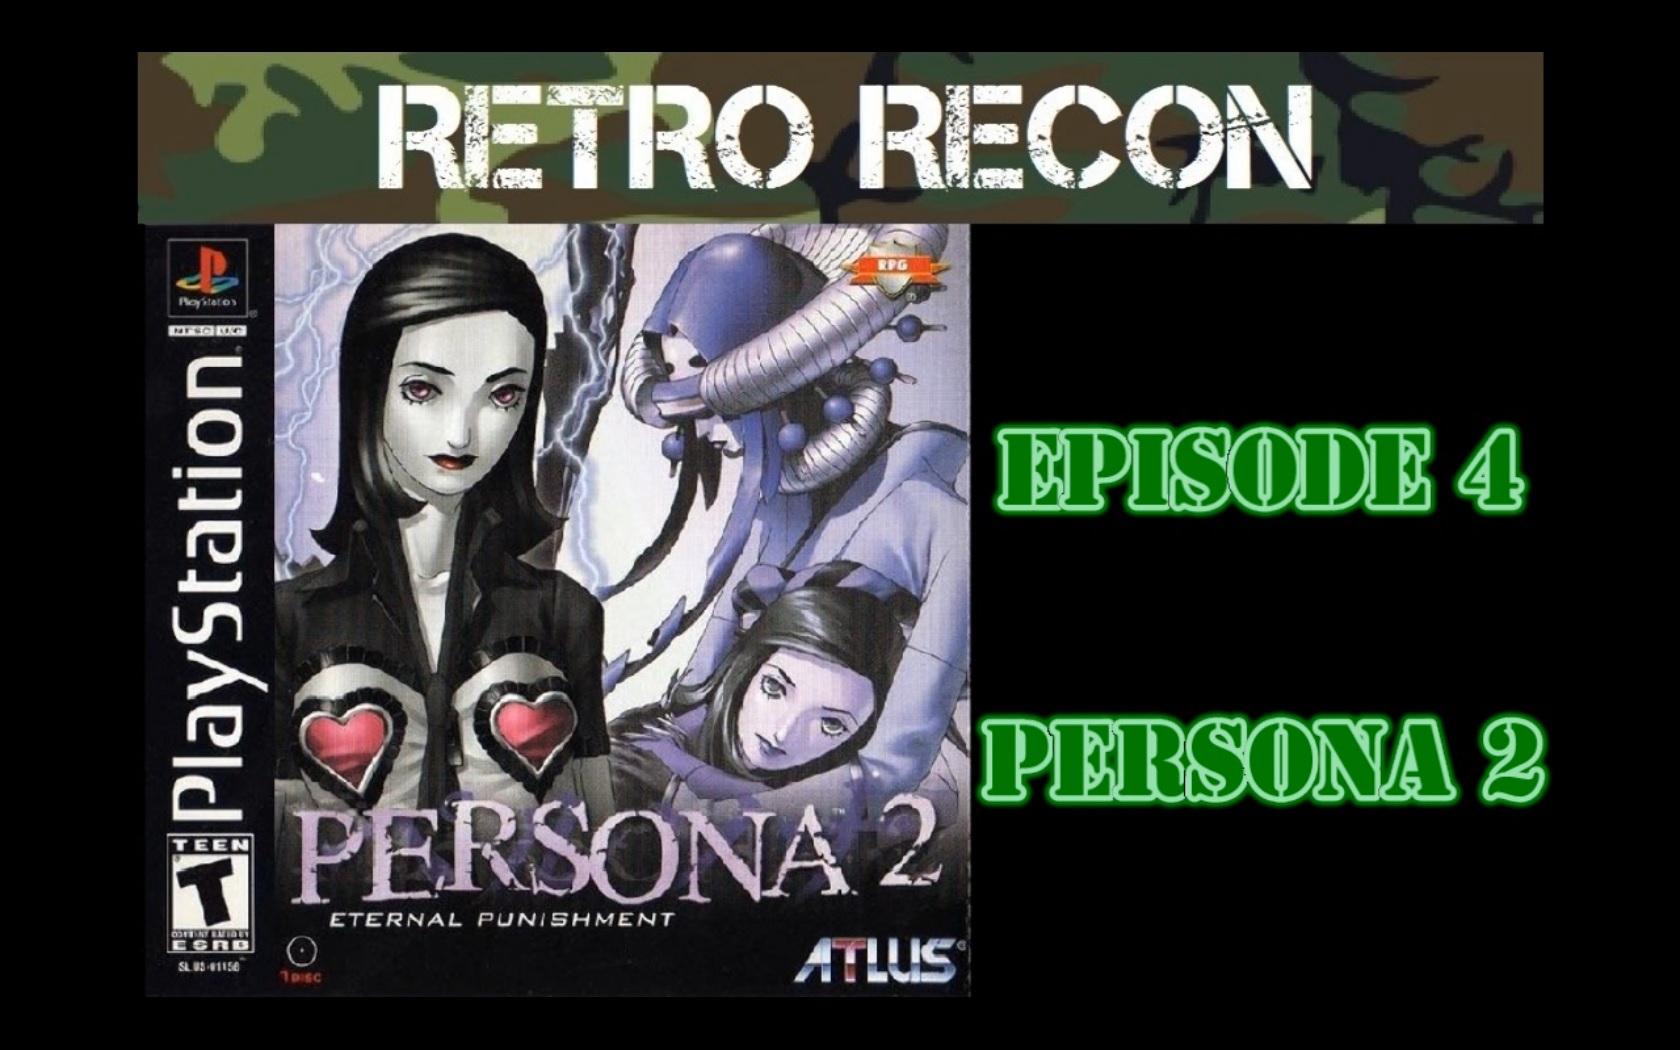 RetroReconTitle4